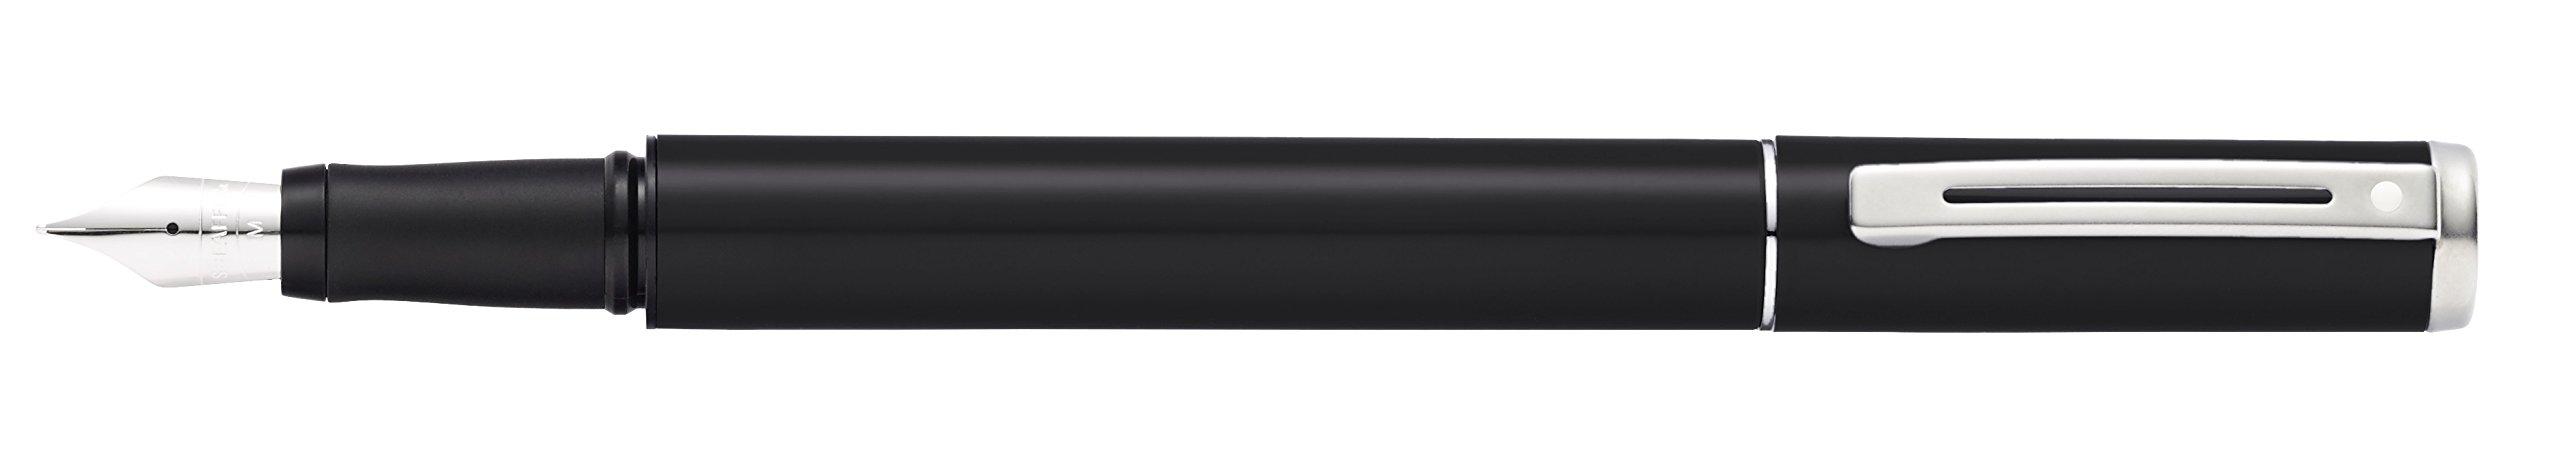 Sheaffer Pop Glossy Black Fountain Pen with Chrome Trim and Medium Nib